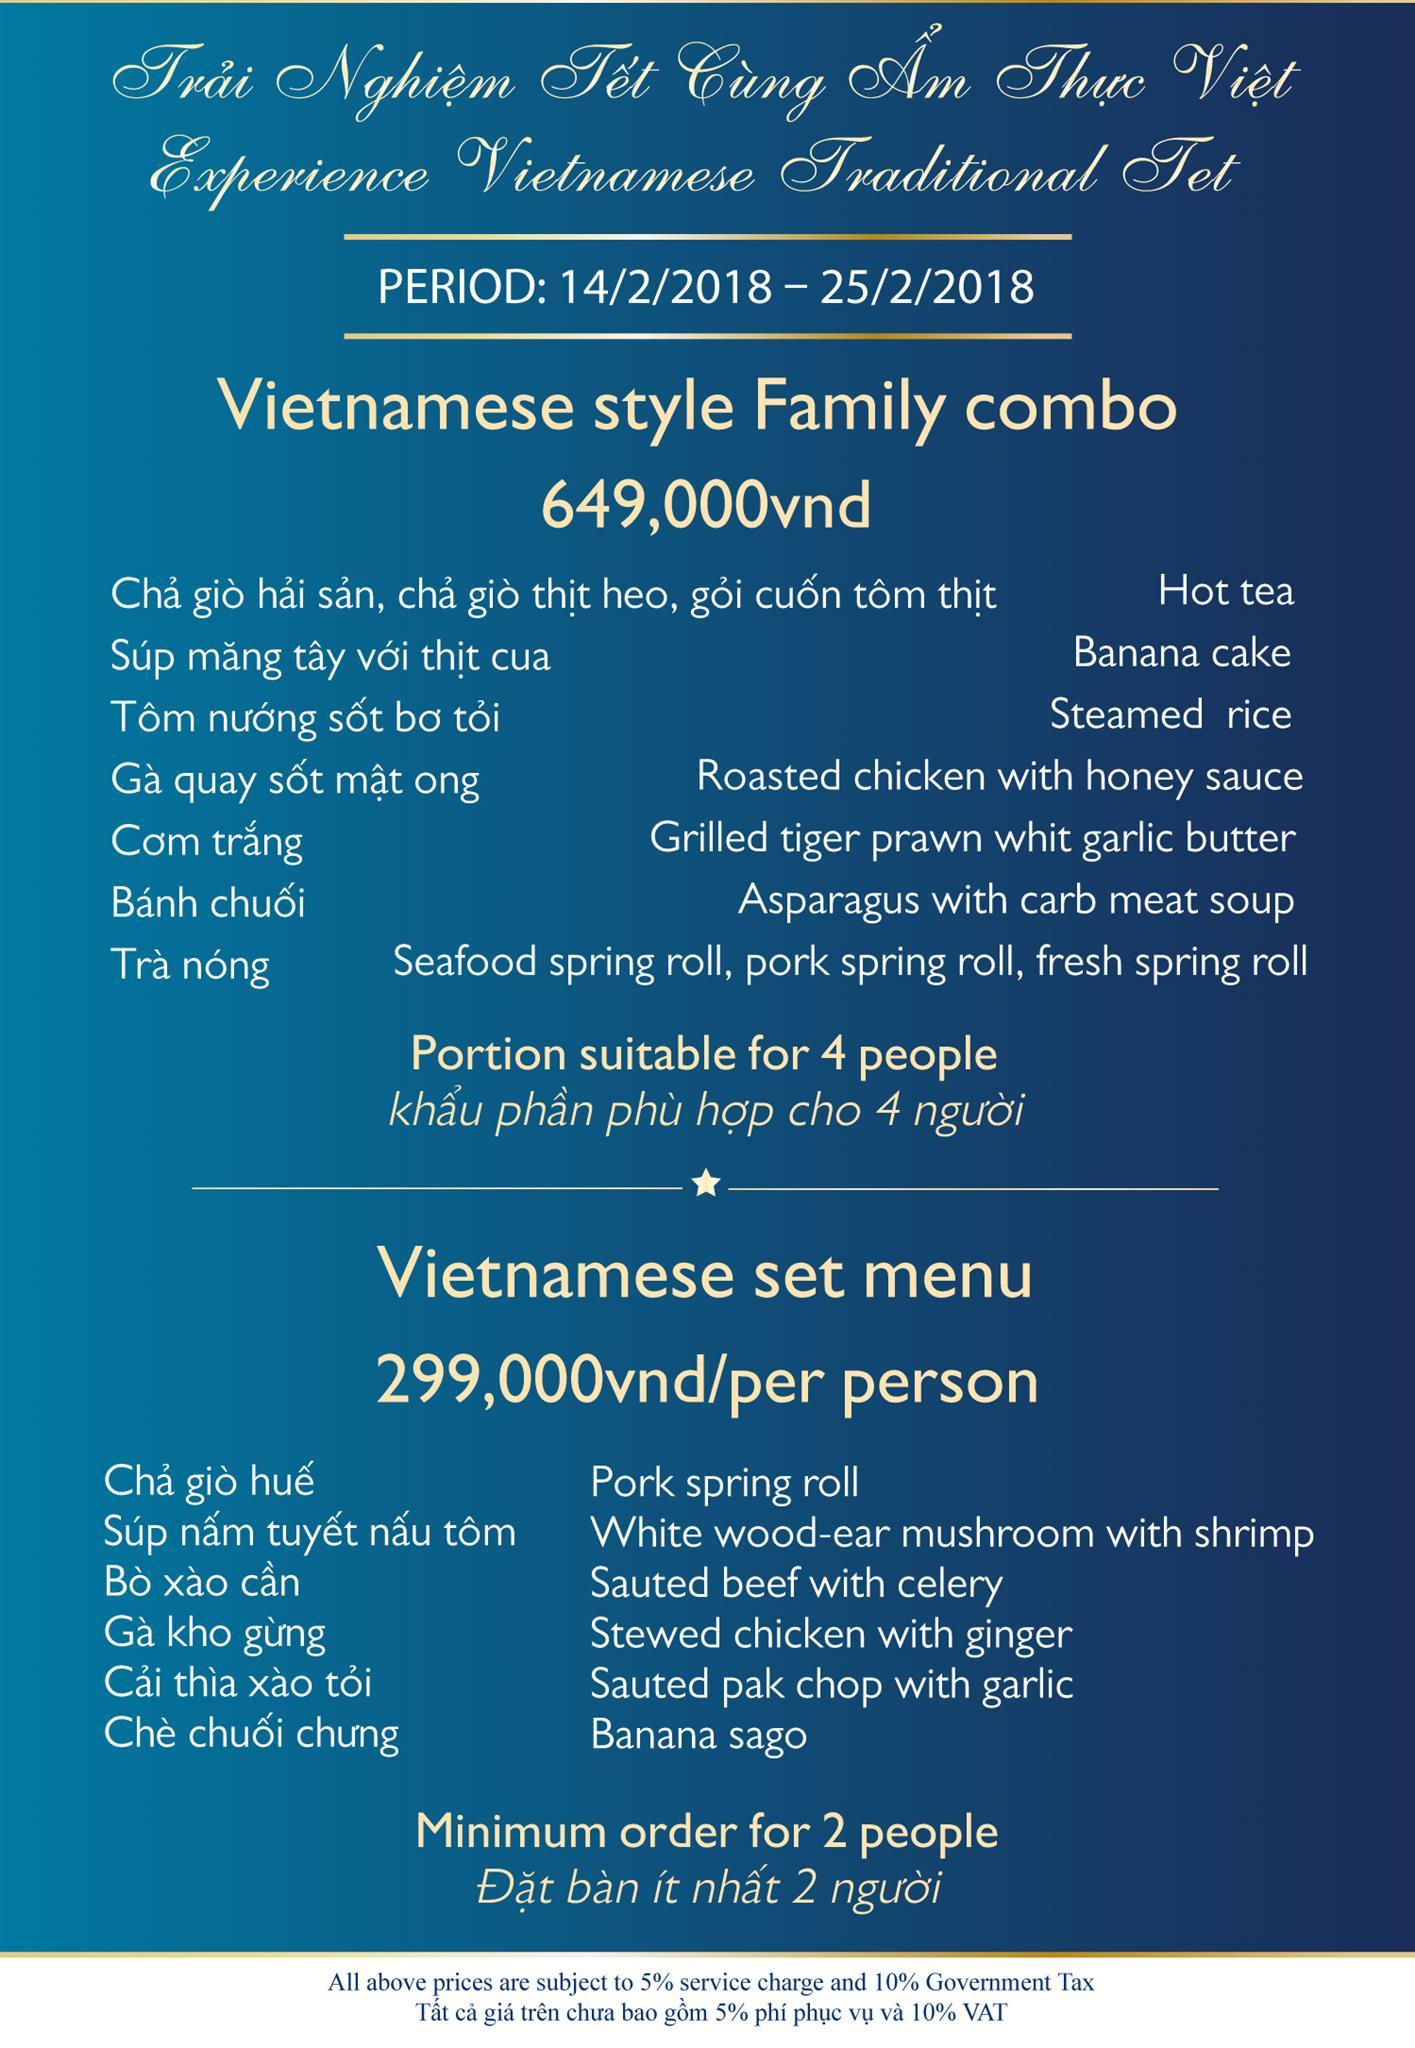 Experience Vietnamese Traditional Tet at Diamond Sea Hotel Danang 1